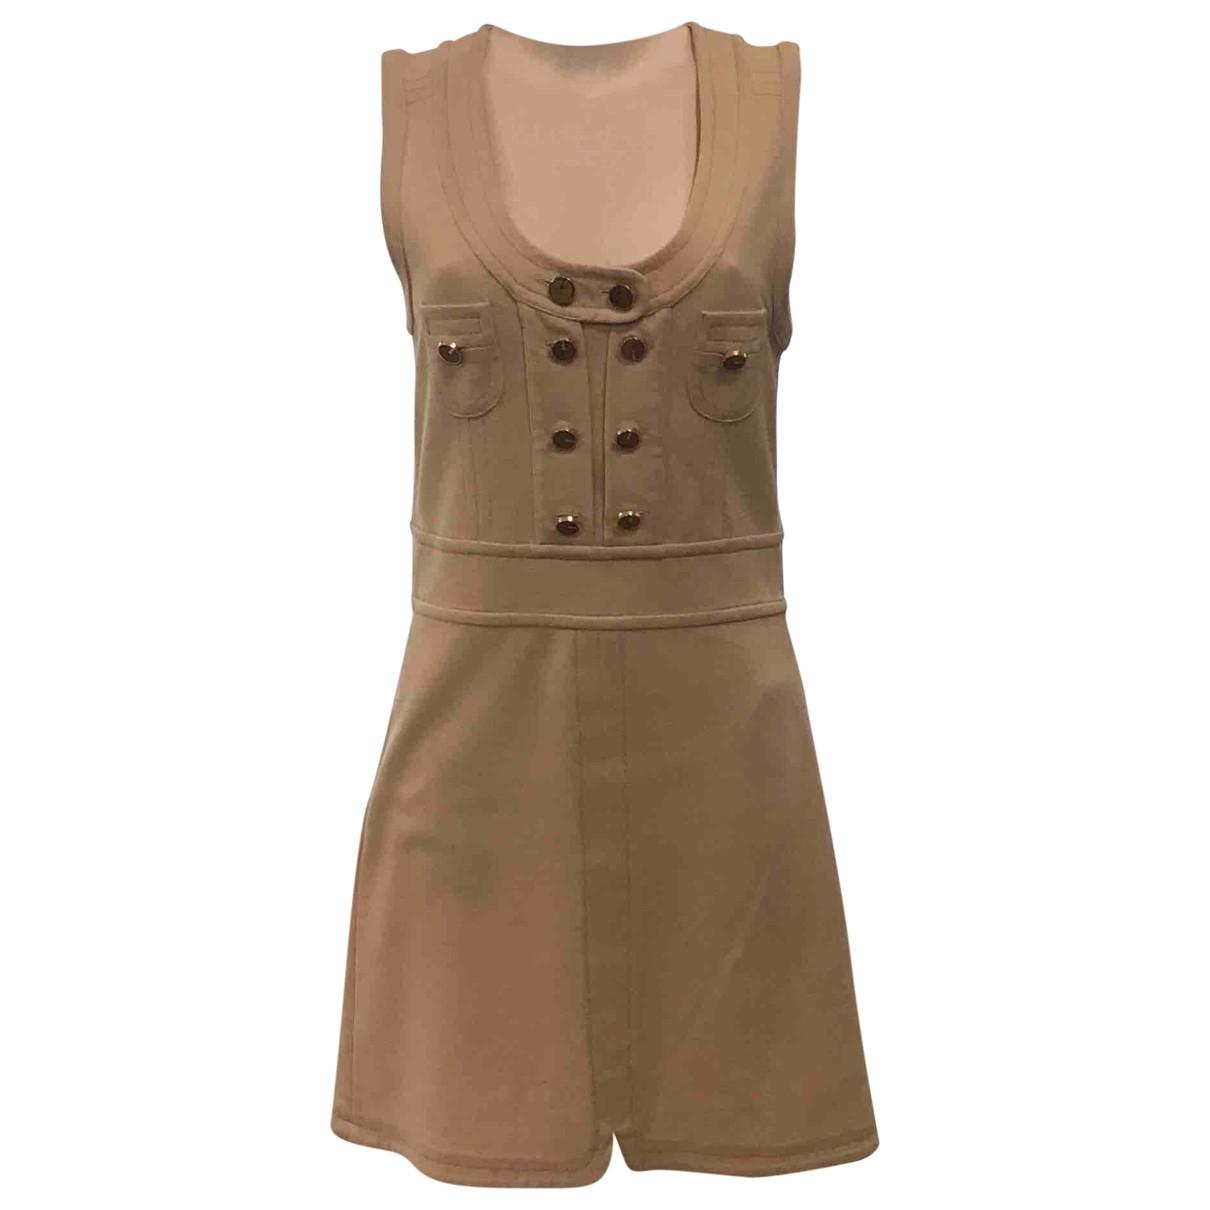 Chloé \N Beige Cotton dress for Women M International